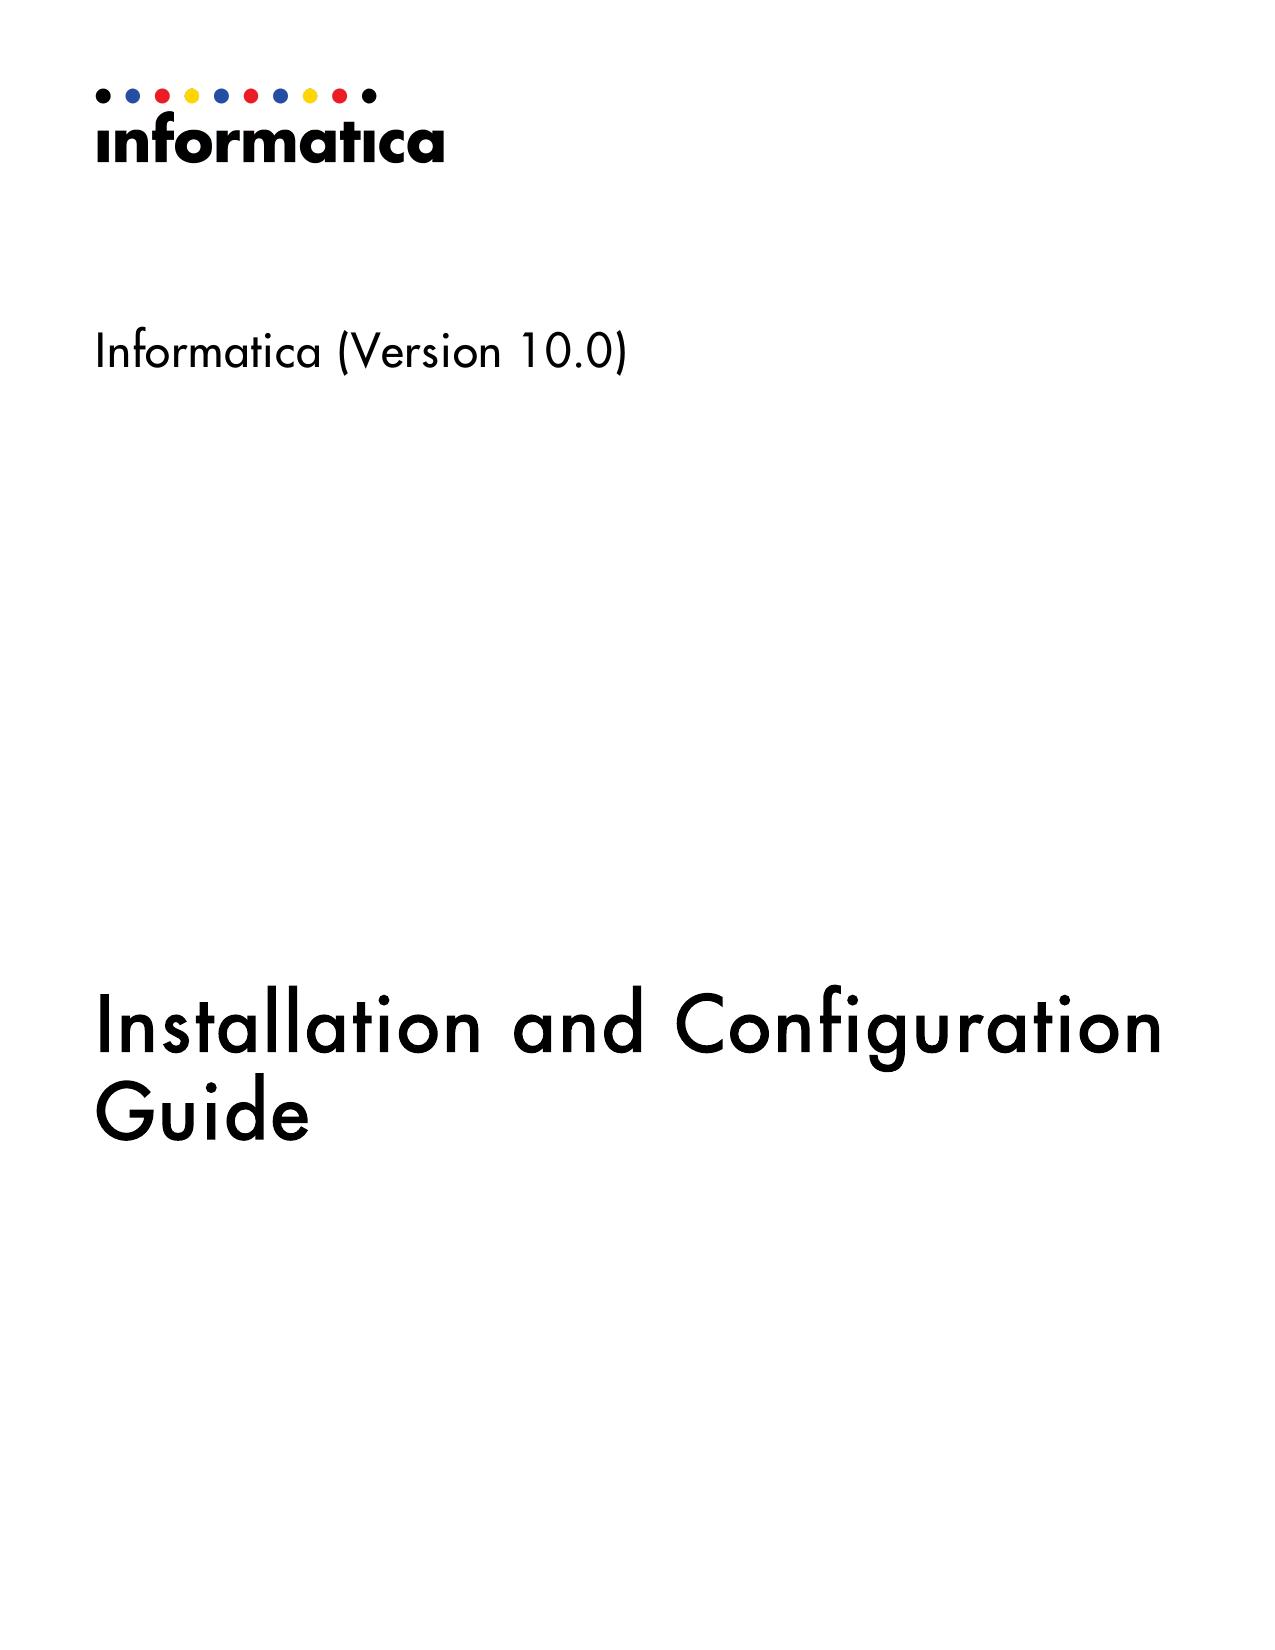 Installation and Configuration Guide | manualzz com